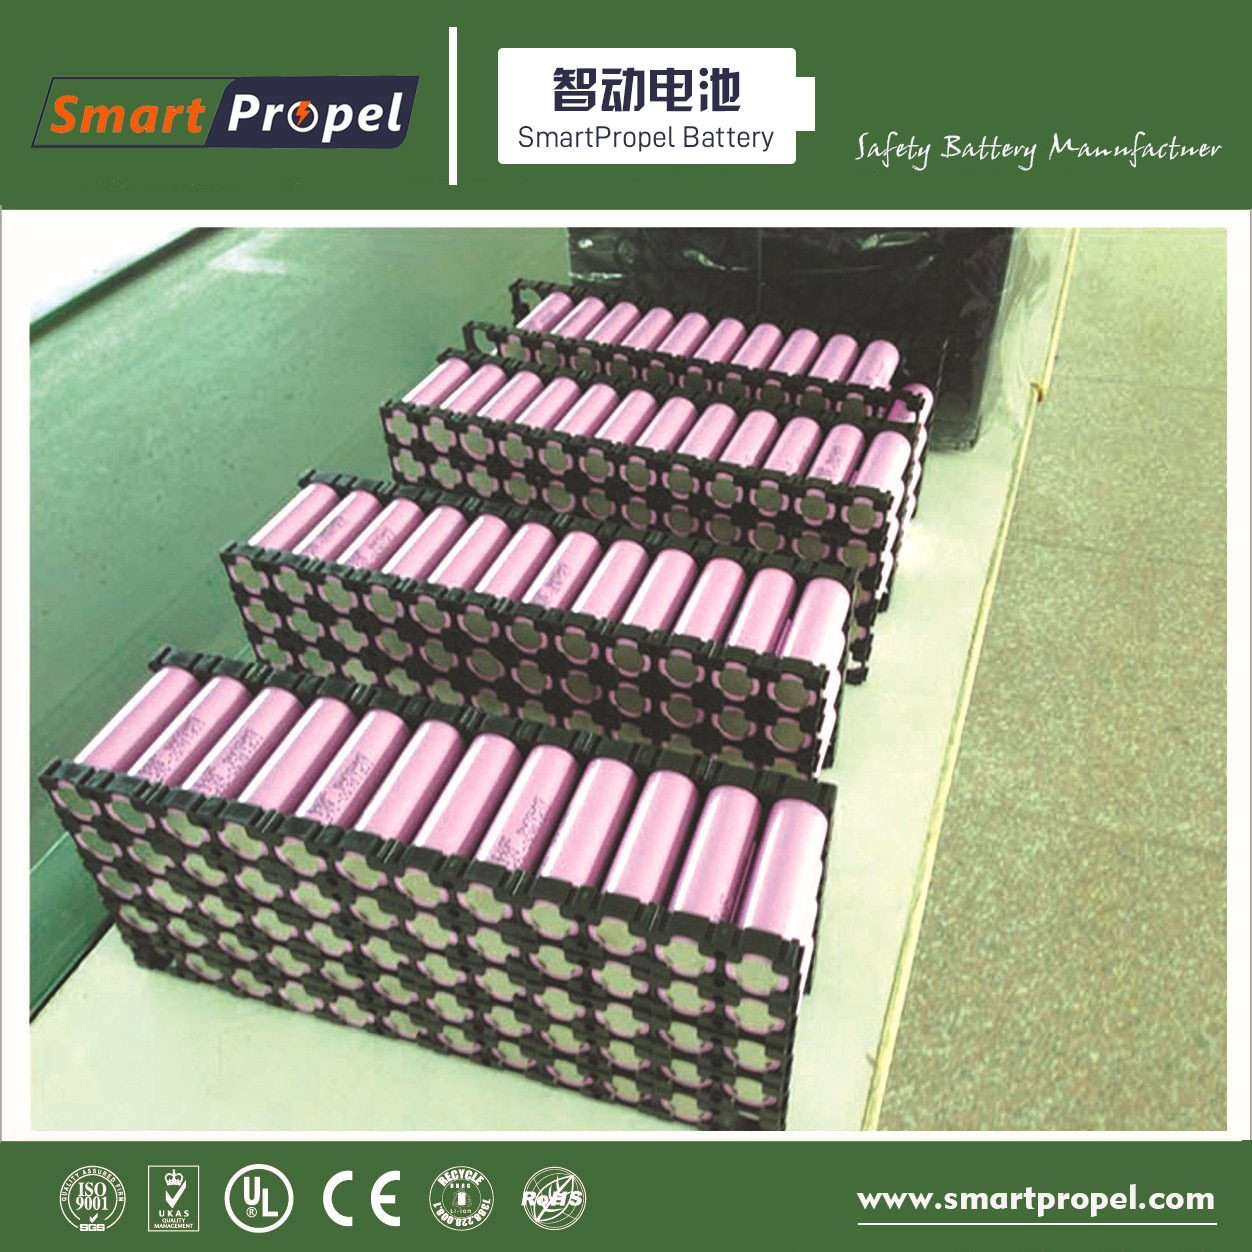 SmartPropel-Battery